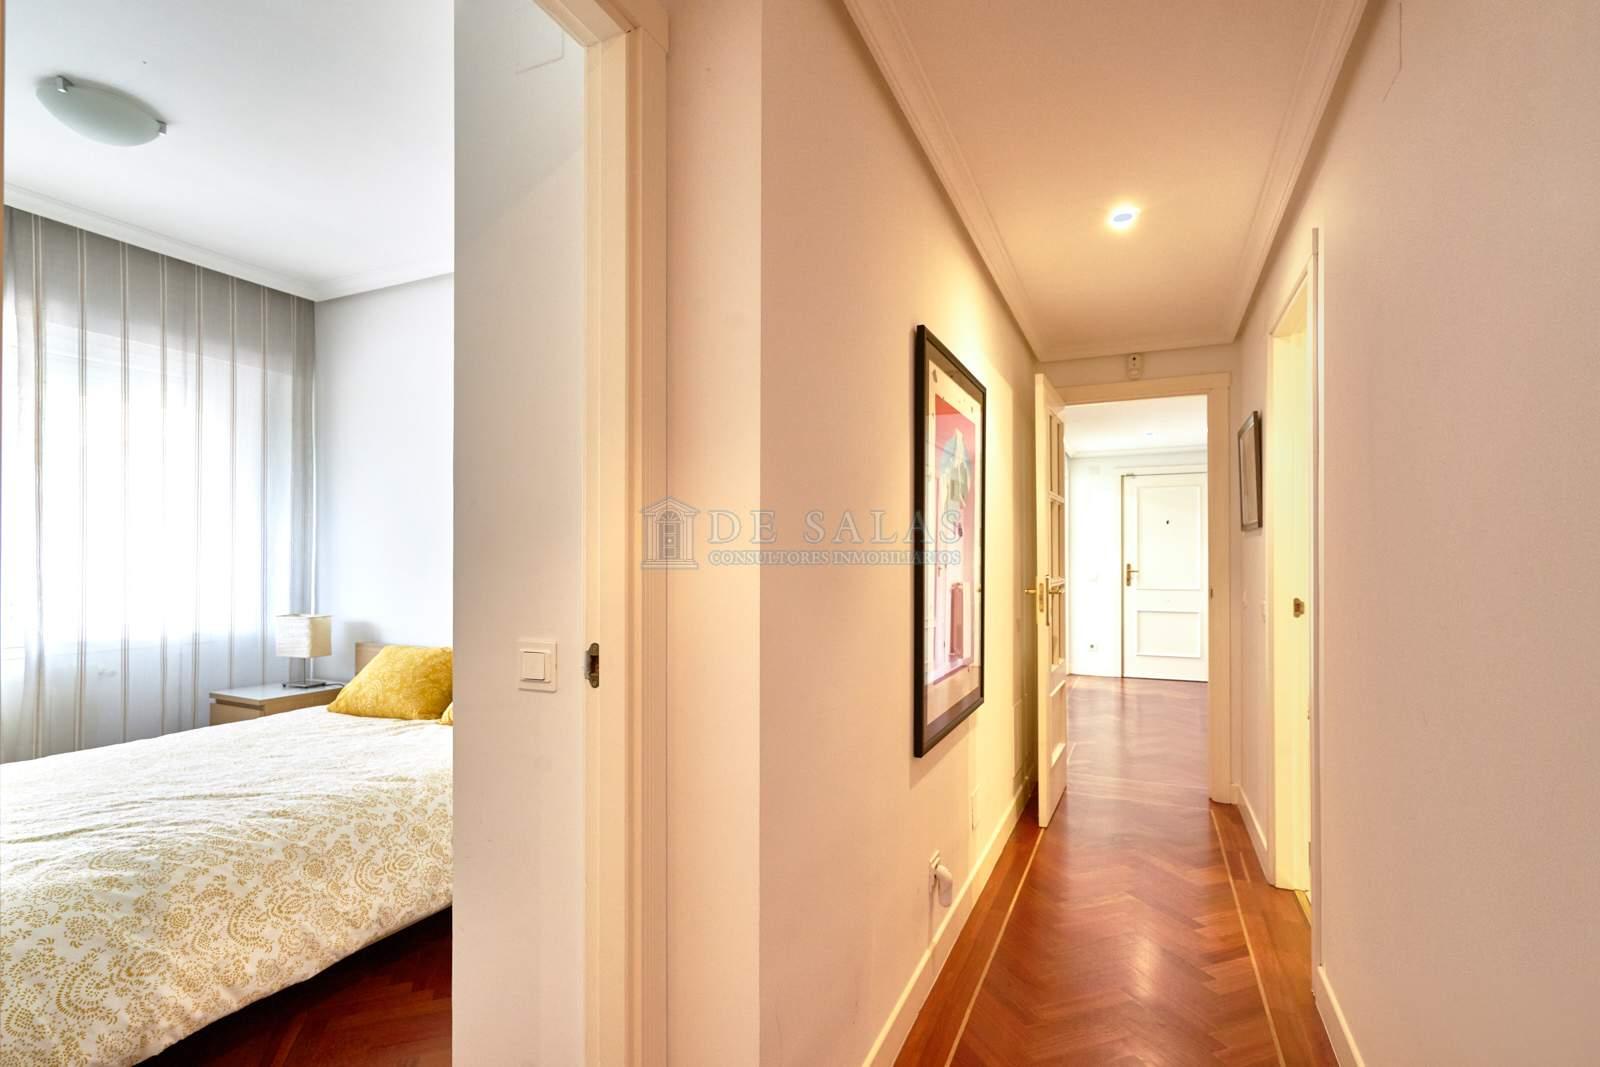 Dormitorio-0013